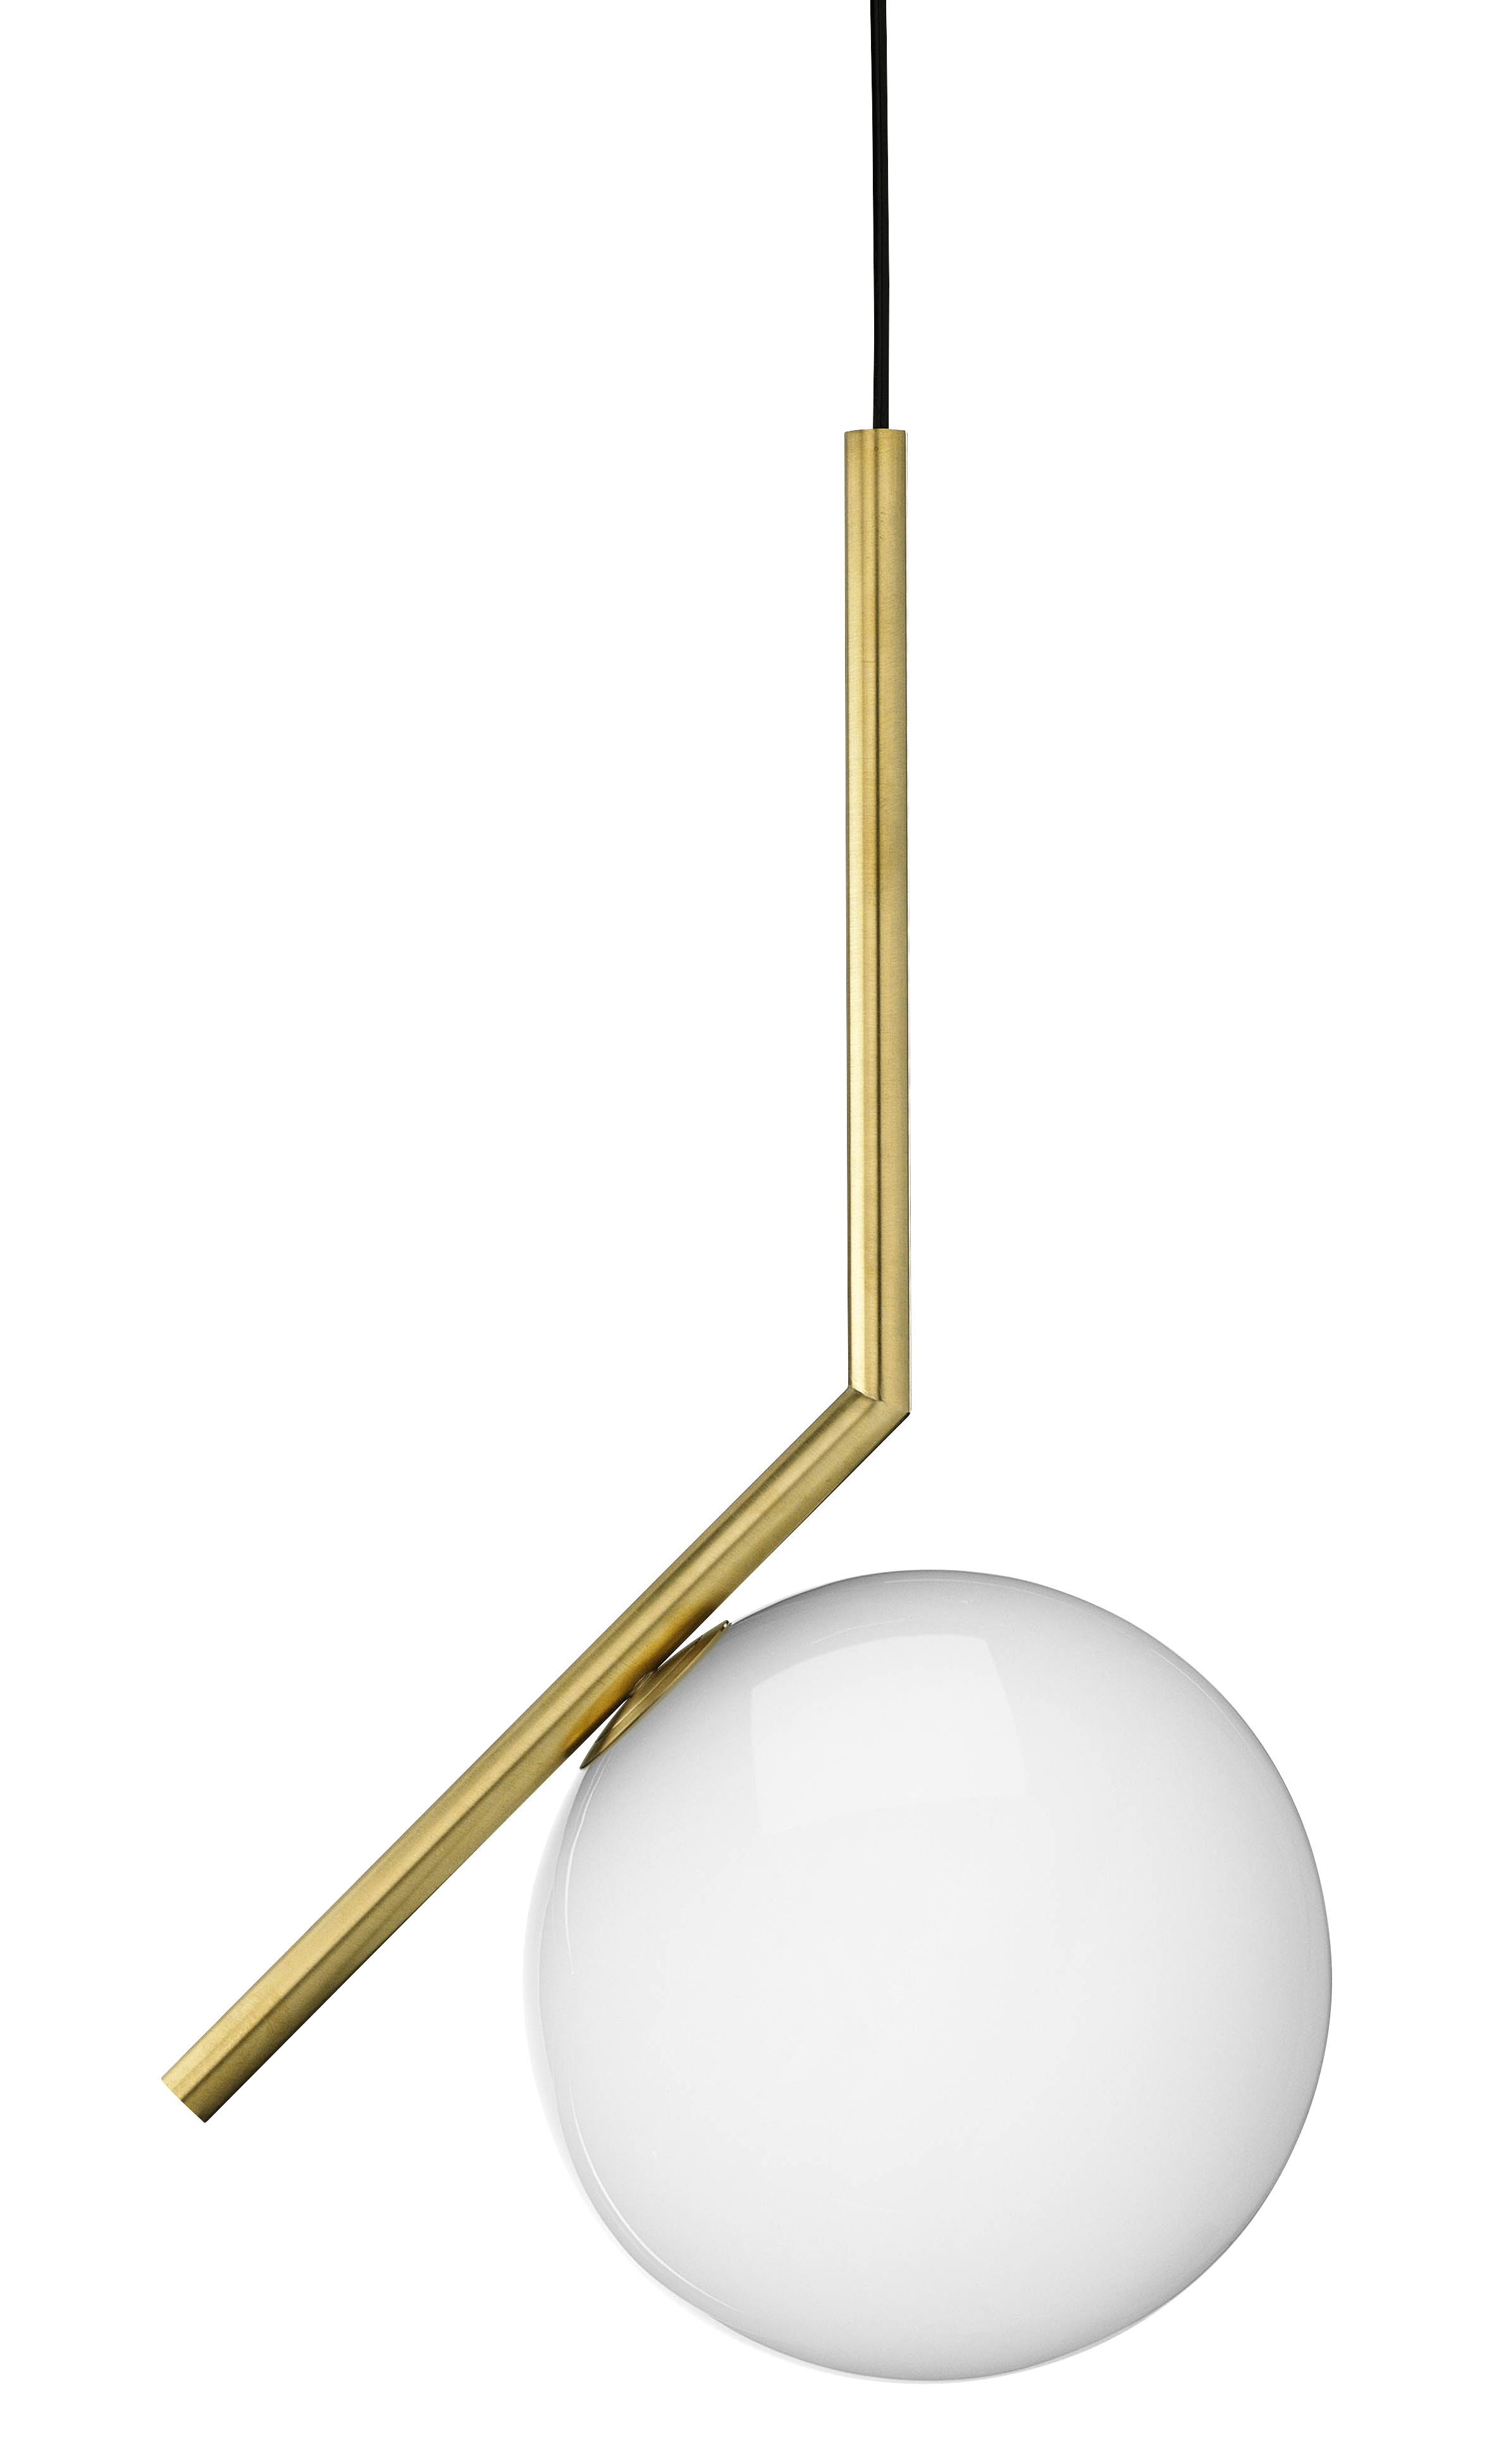 Illuminazione - Lampadari - Sospensione IC S1 - / H 48,2 cm di Flos - Ottone - Acciaio, vetro soffiato